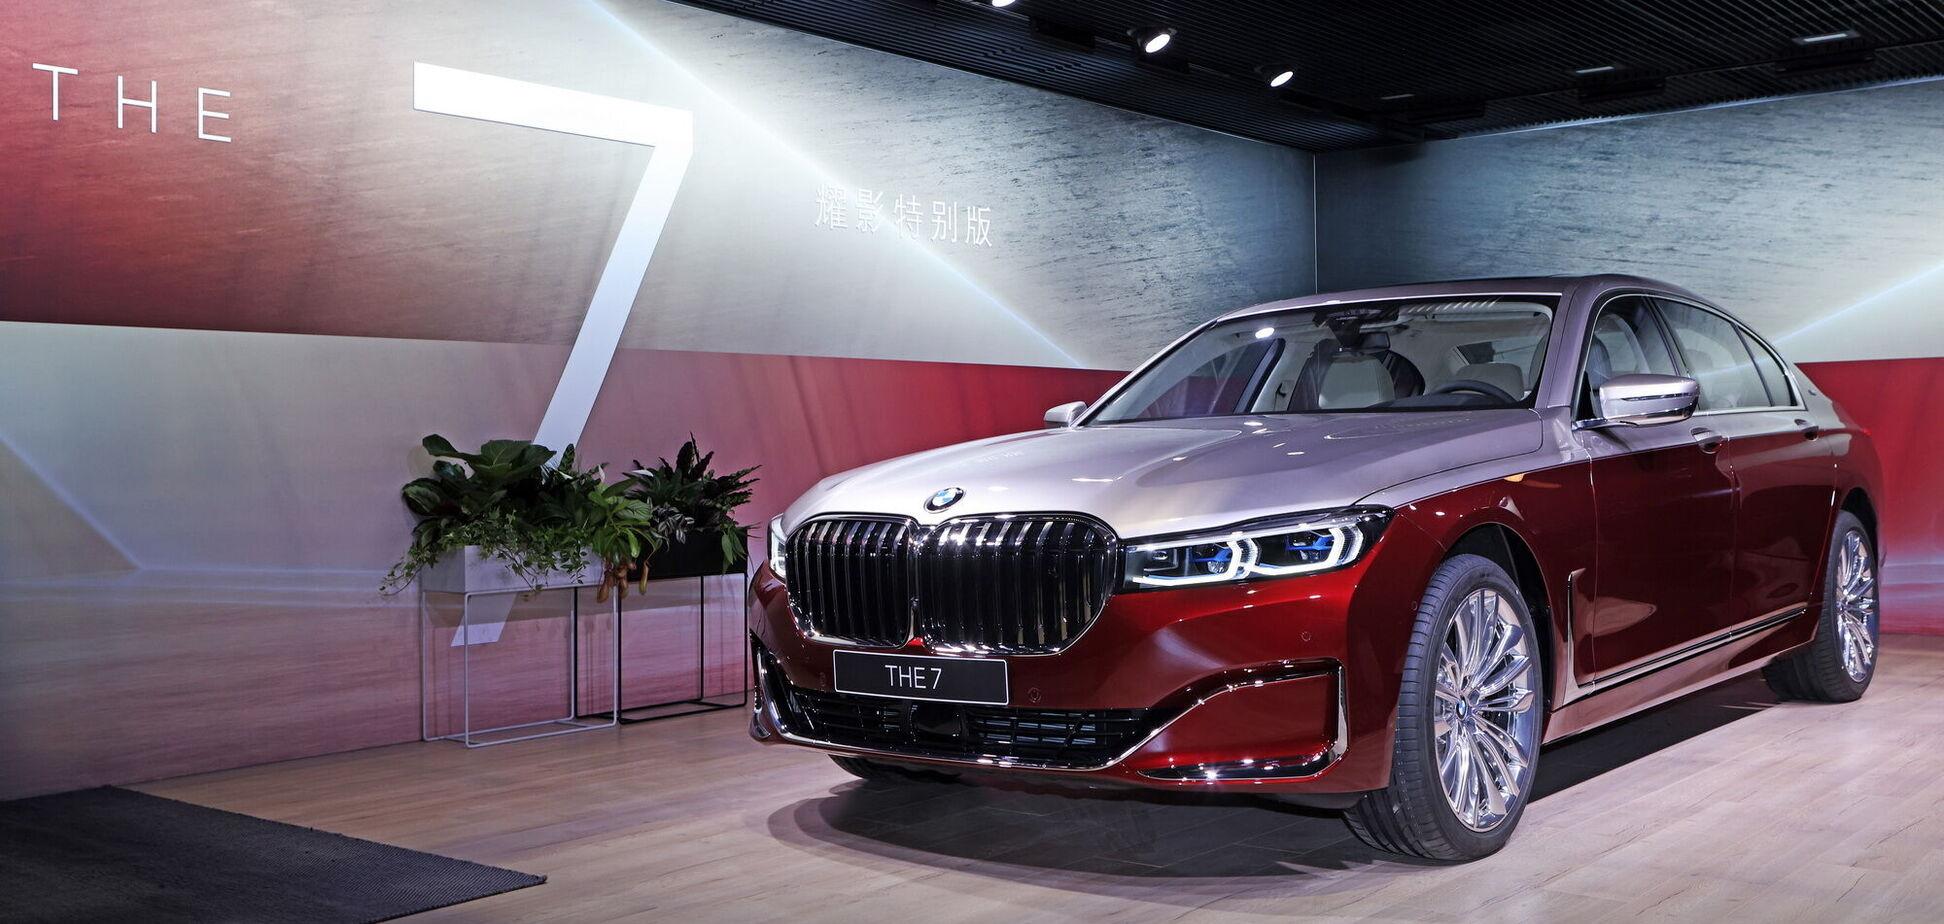 BMW показала лімузин у стилі Maybach